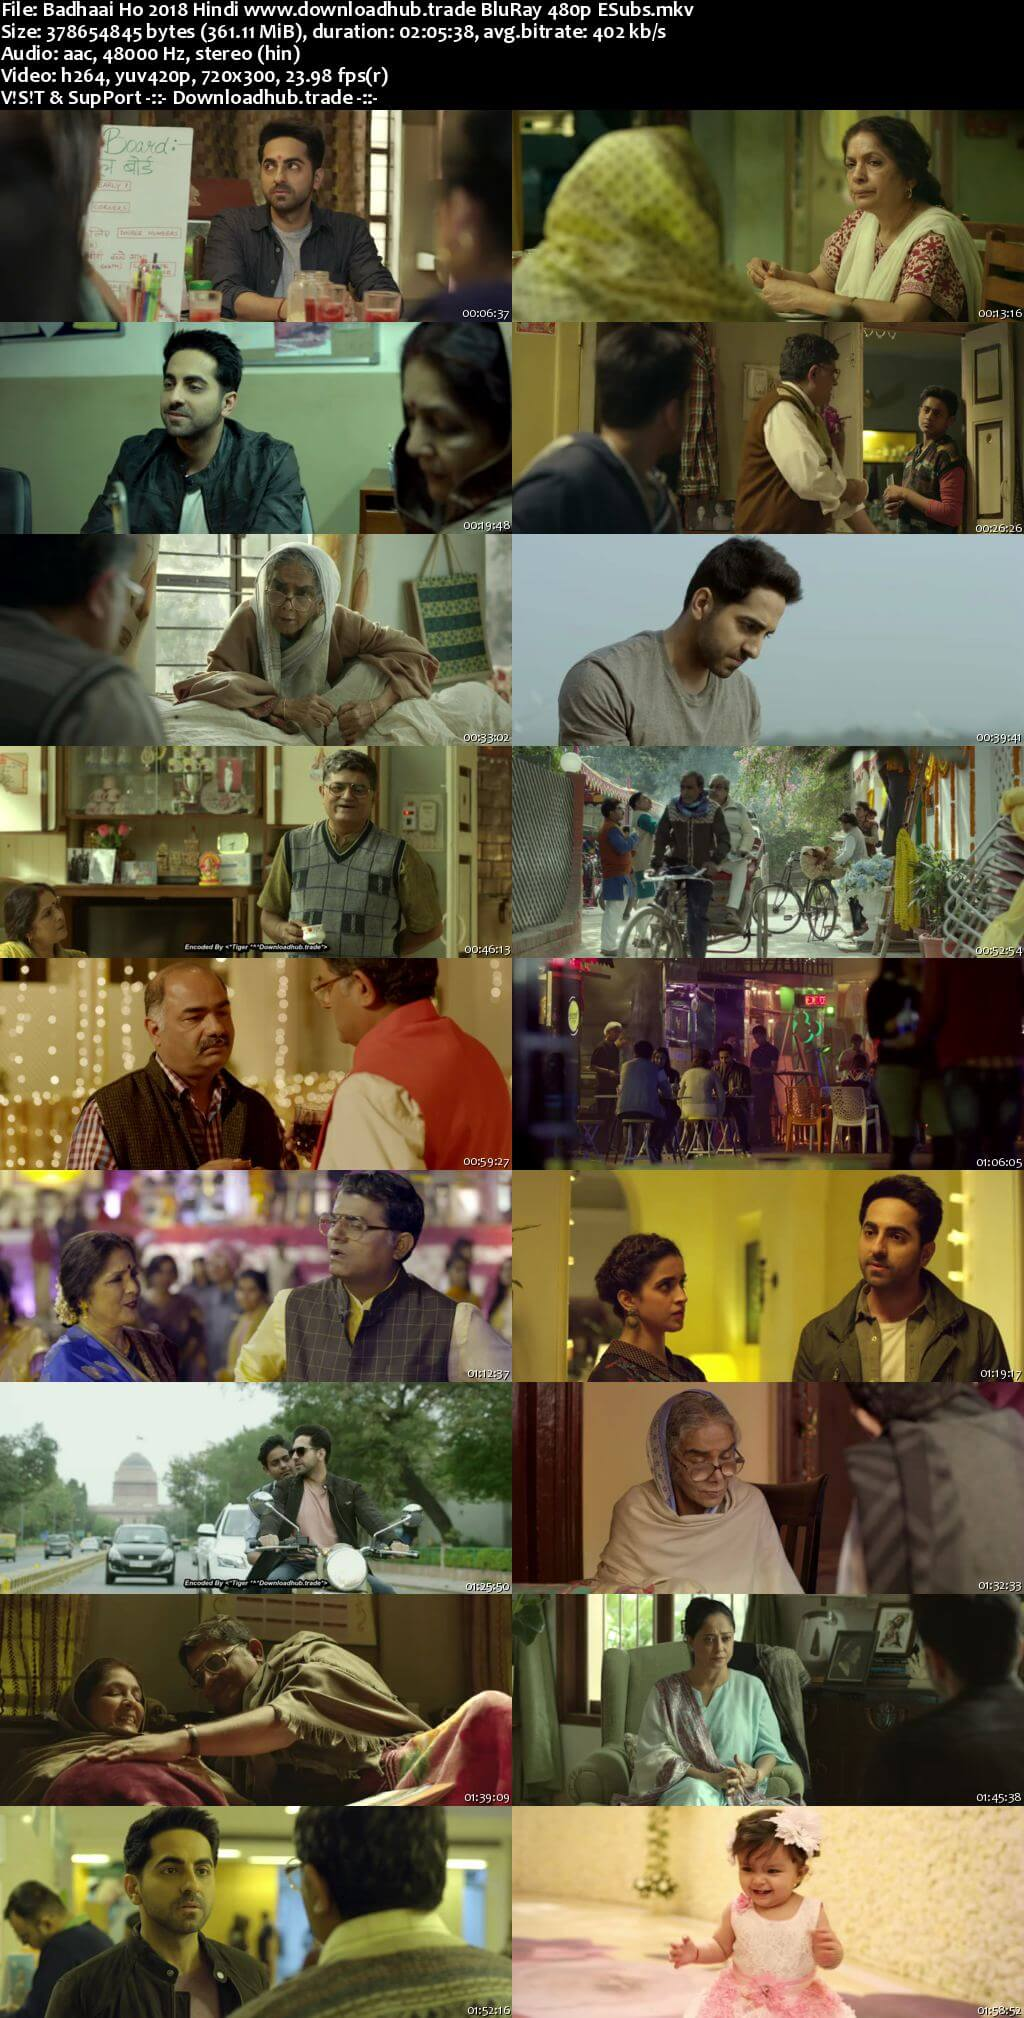 Badhaai Ho 2018 Hindi 350MB BluRay 480p ESubs